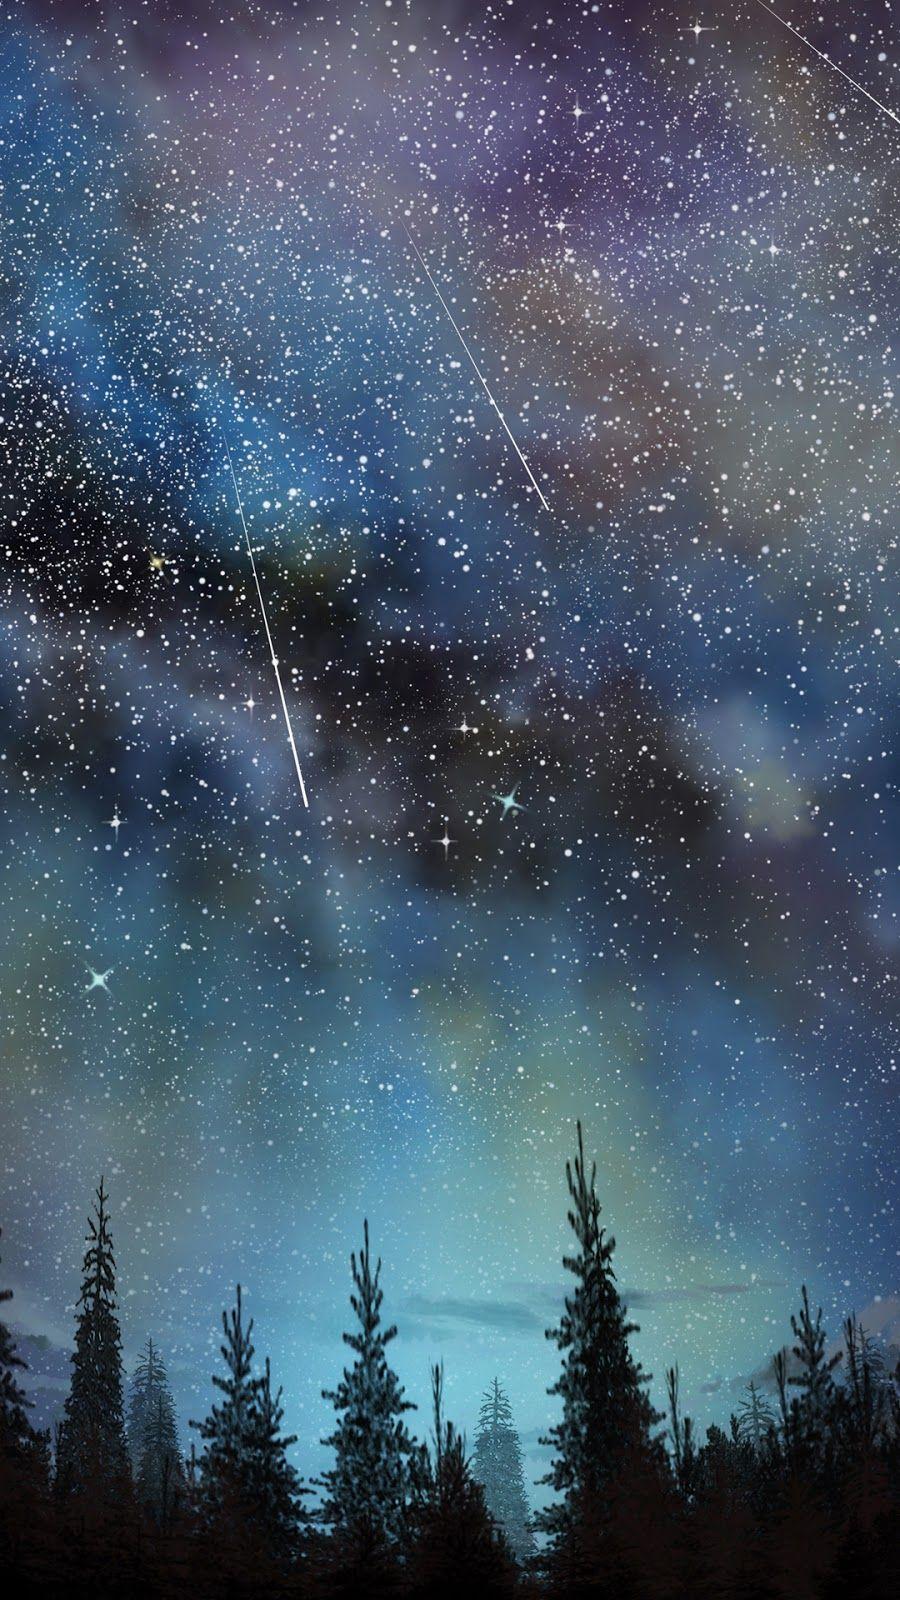 Shooting Star Wallpaper Myfavwallpaper Lockscreen Iphonewallpaper Smartphone Star Background Galaxy Wallpaper Star Sky